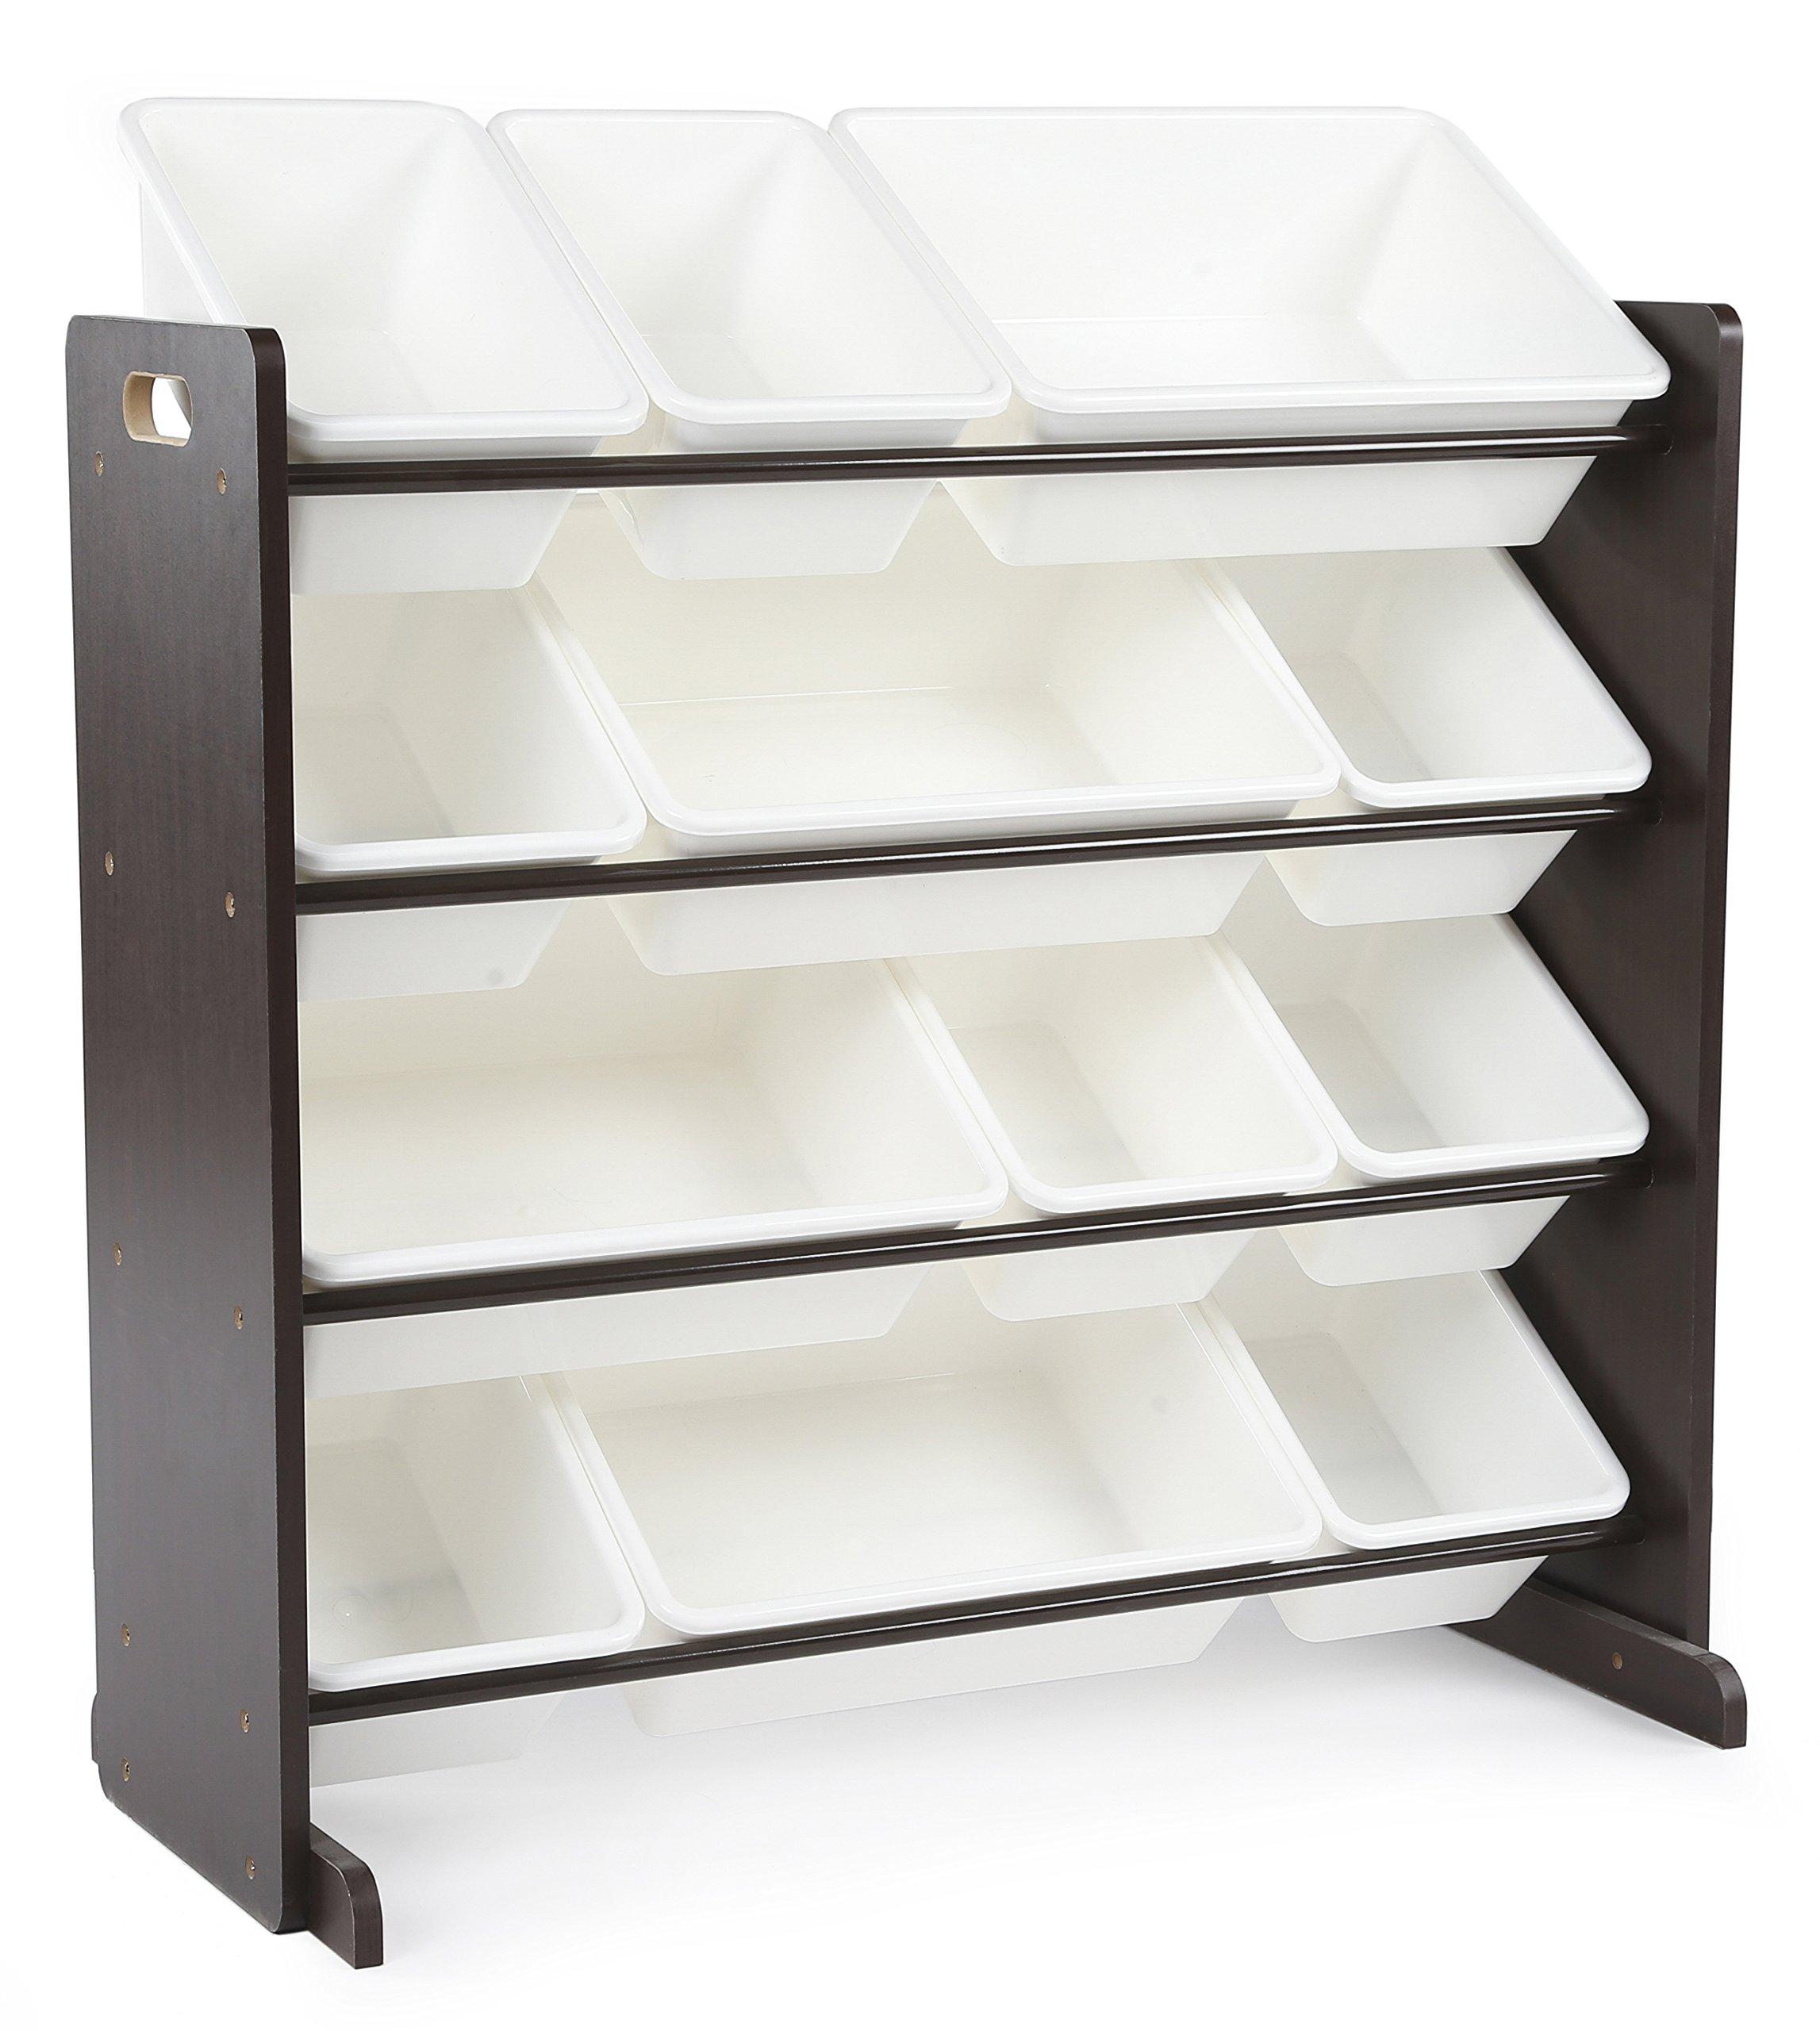 Get Quotations · Tot Tutors Kidsu0027 Toy Storage Organizer With 12 Plastic Bins,  Espresso/White (